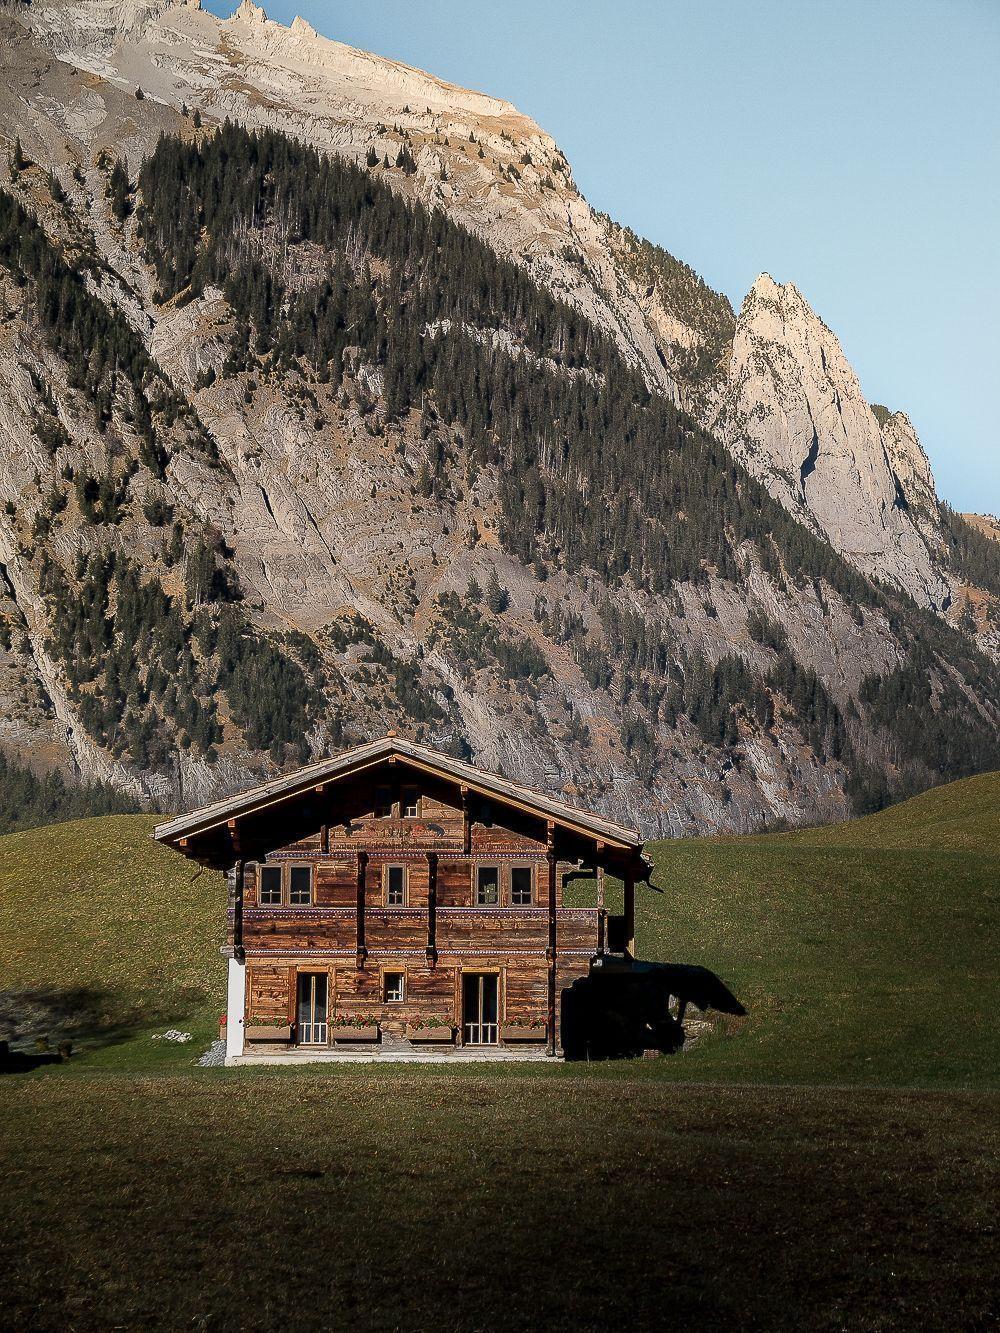 A Beautiful Cabin In Switzerland Mountainhomes La Serendipite Sur Instagram Mountain House Plans Tiny House Plans Small Cottages Beautiful Cabins